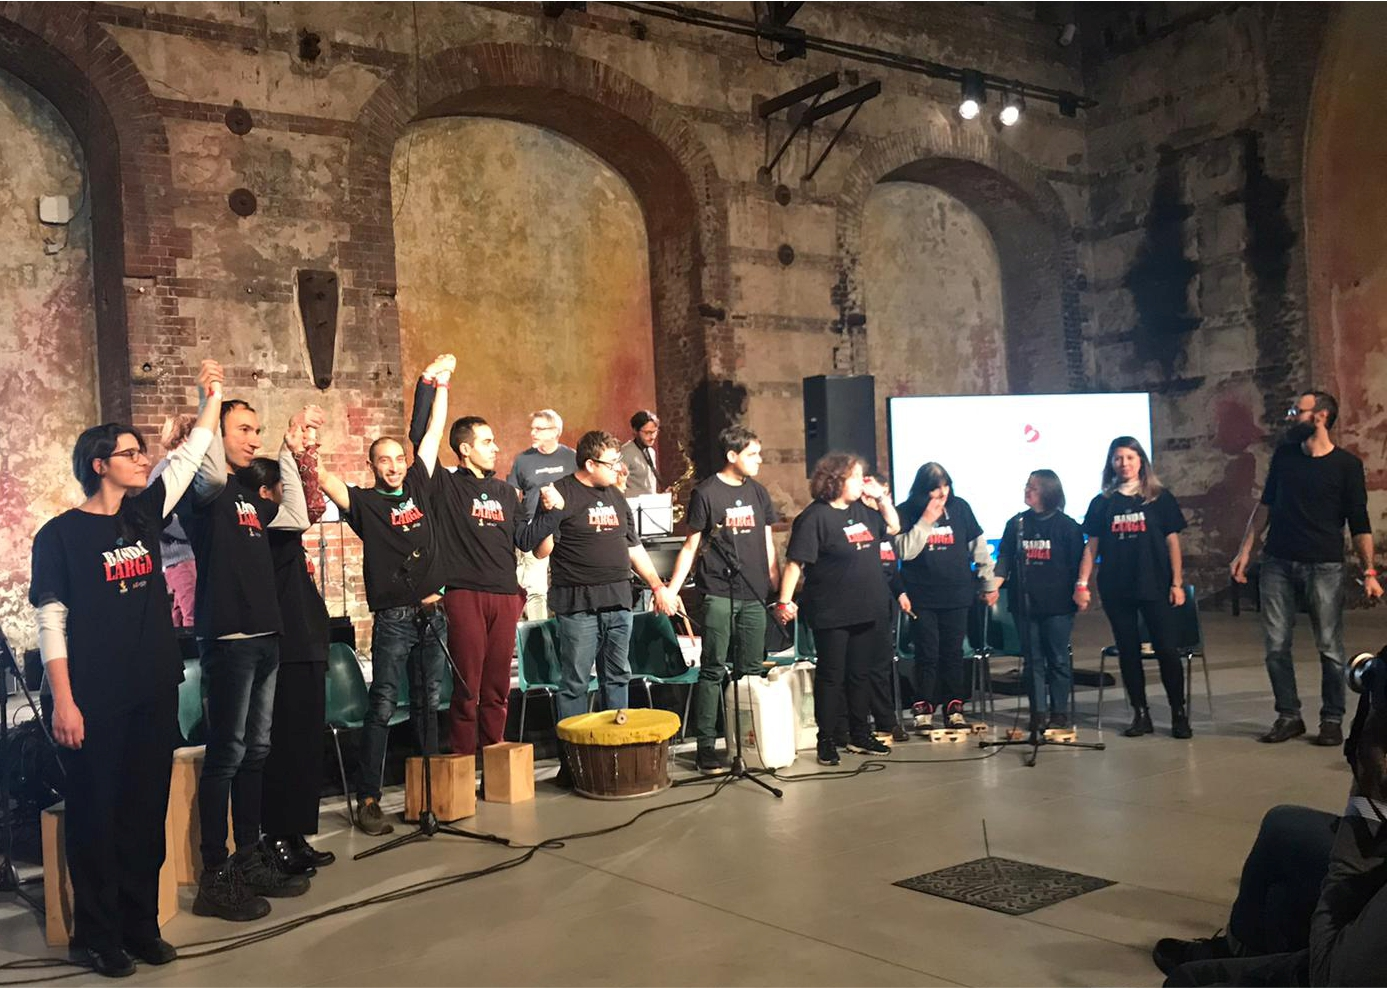 La Banda Larga Live Alle OGR Torino